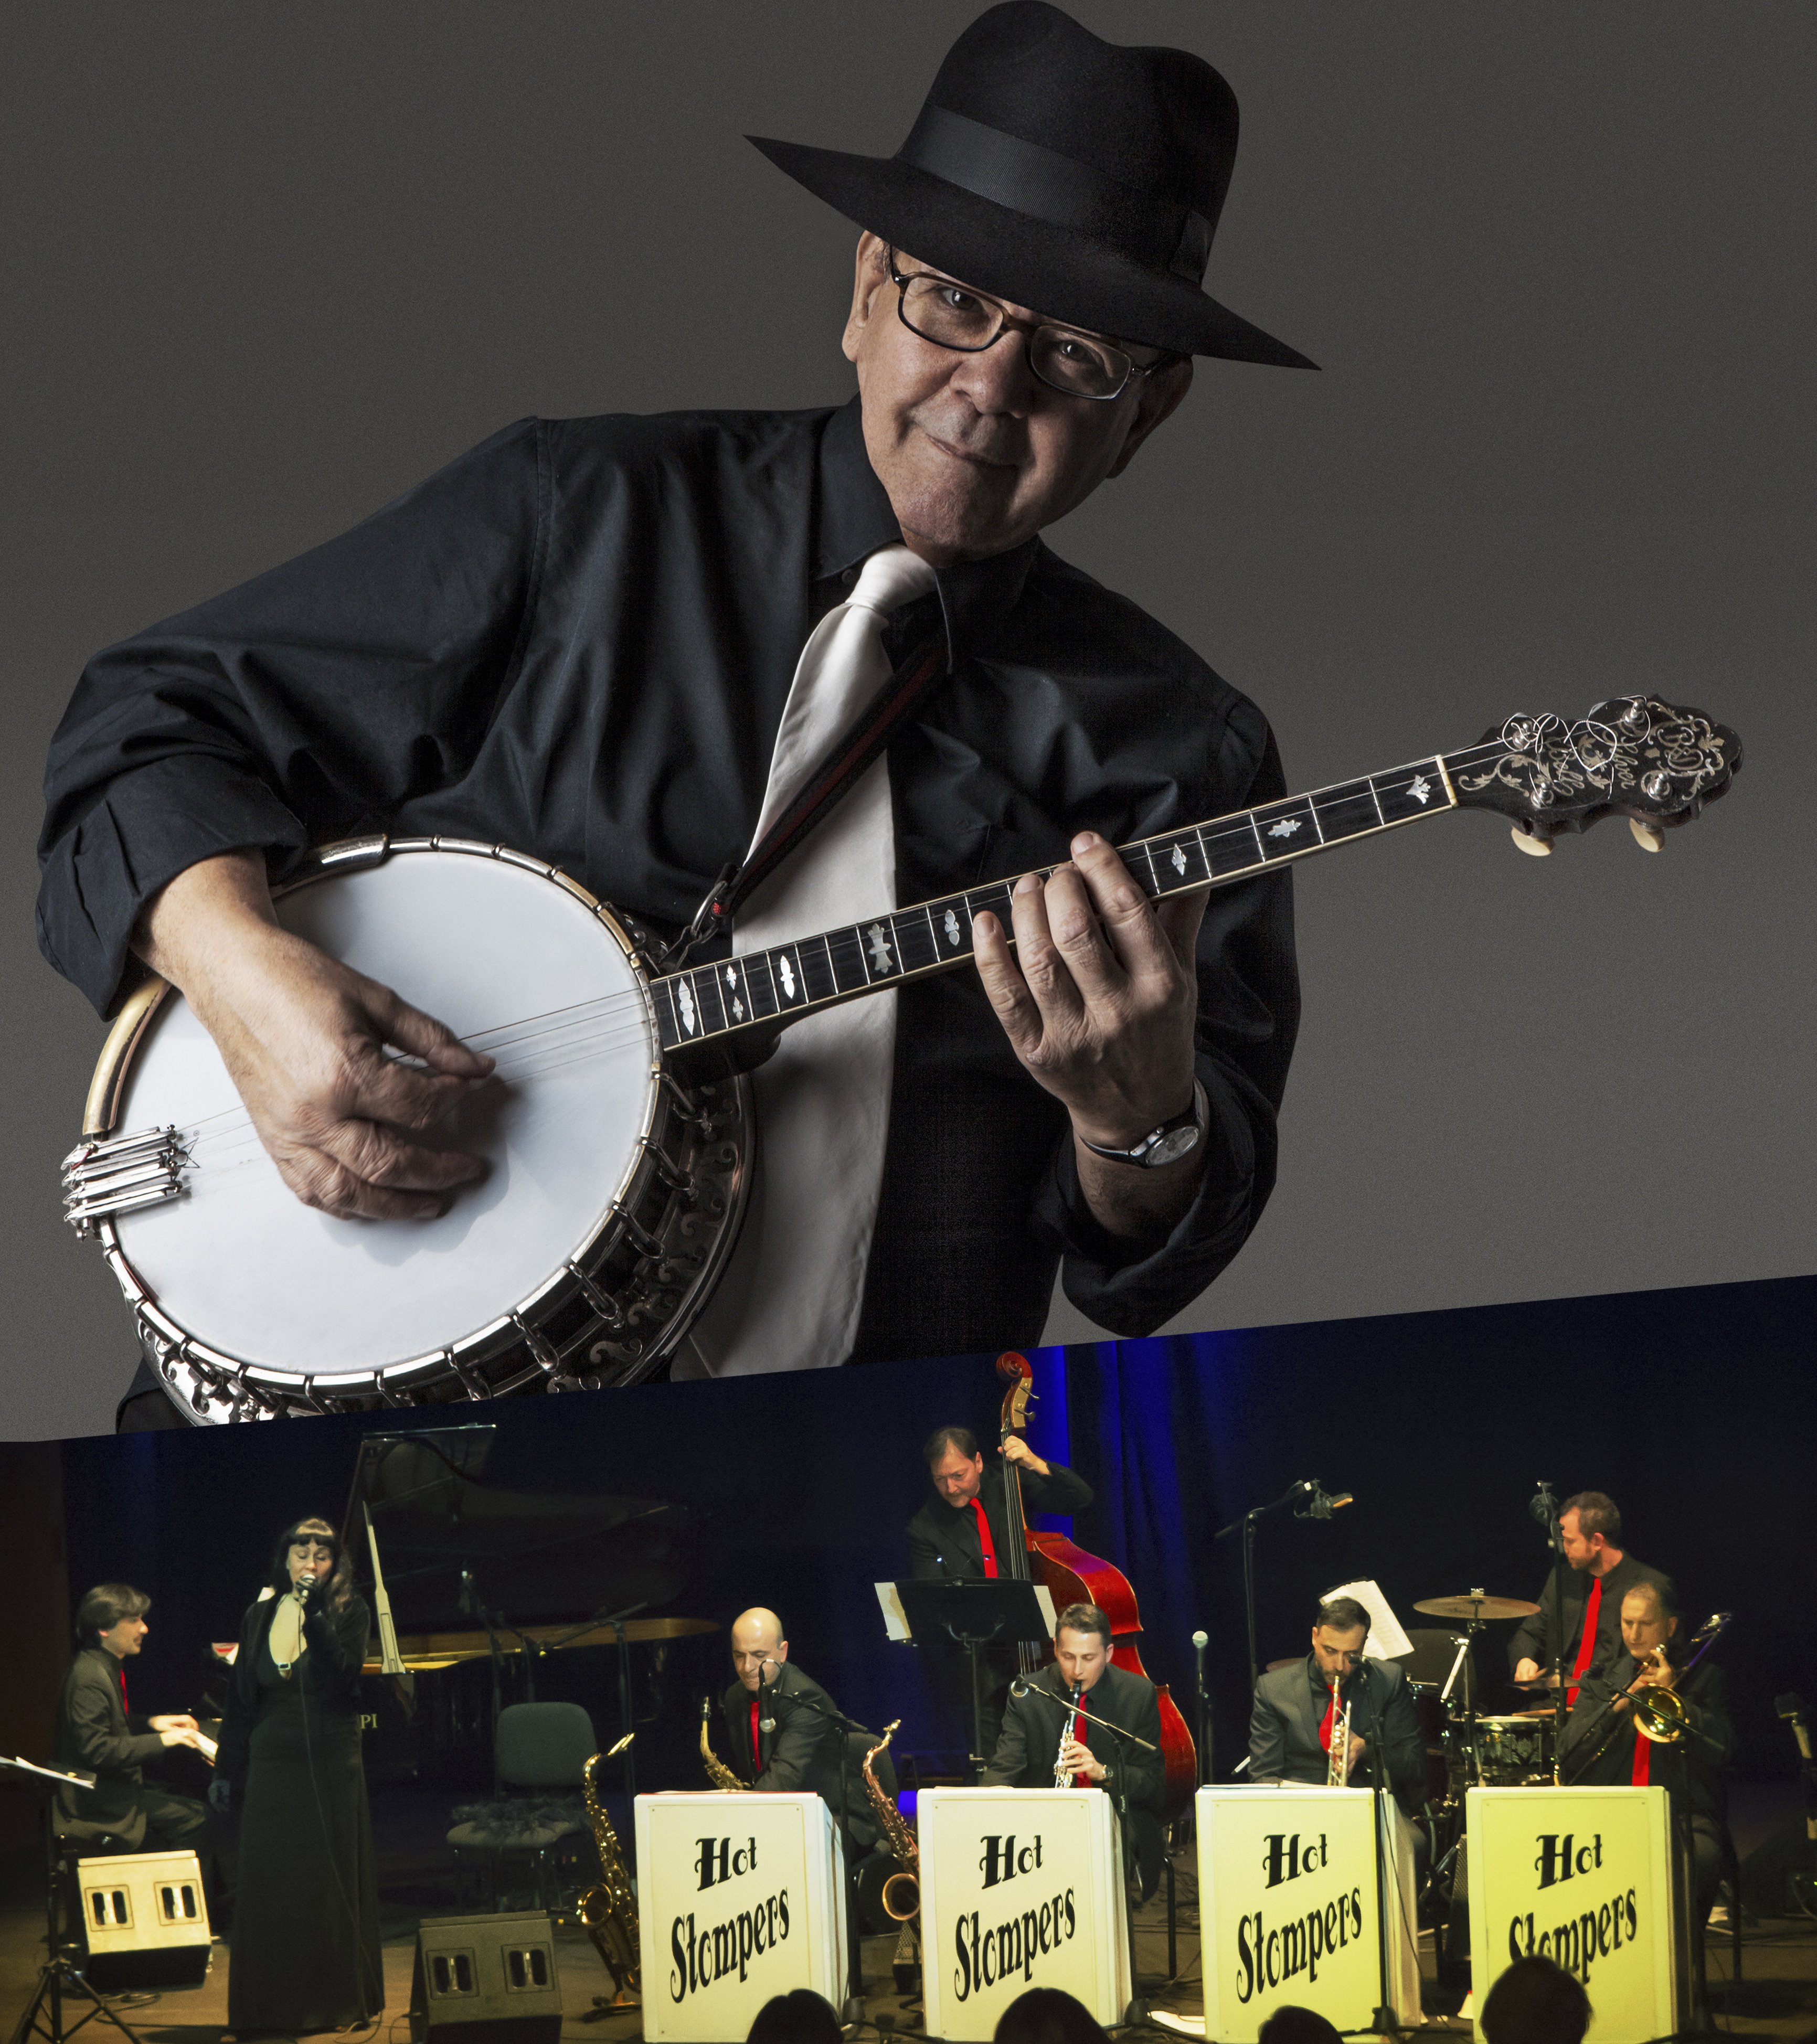 25.5.17 • Lino Patruno & Hot Stompers • Auditorium Parco della Musica